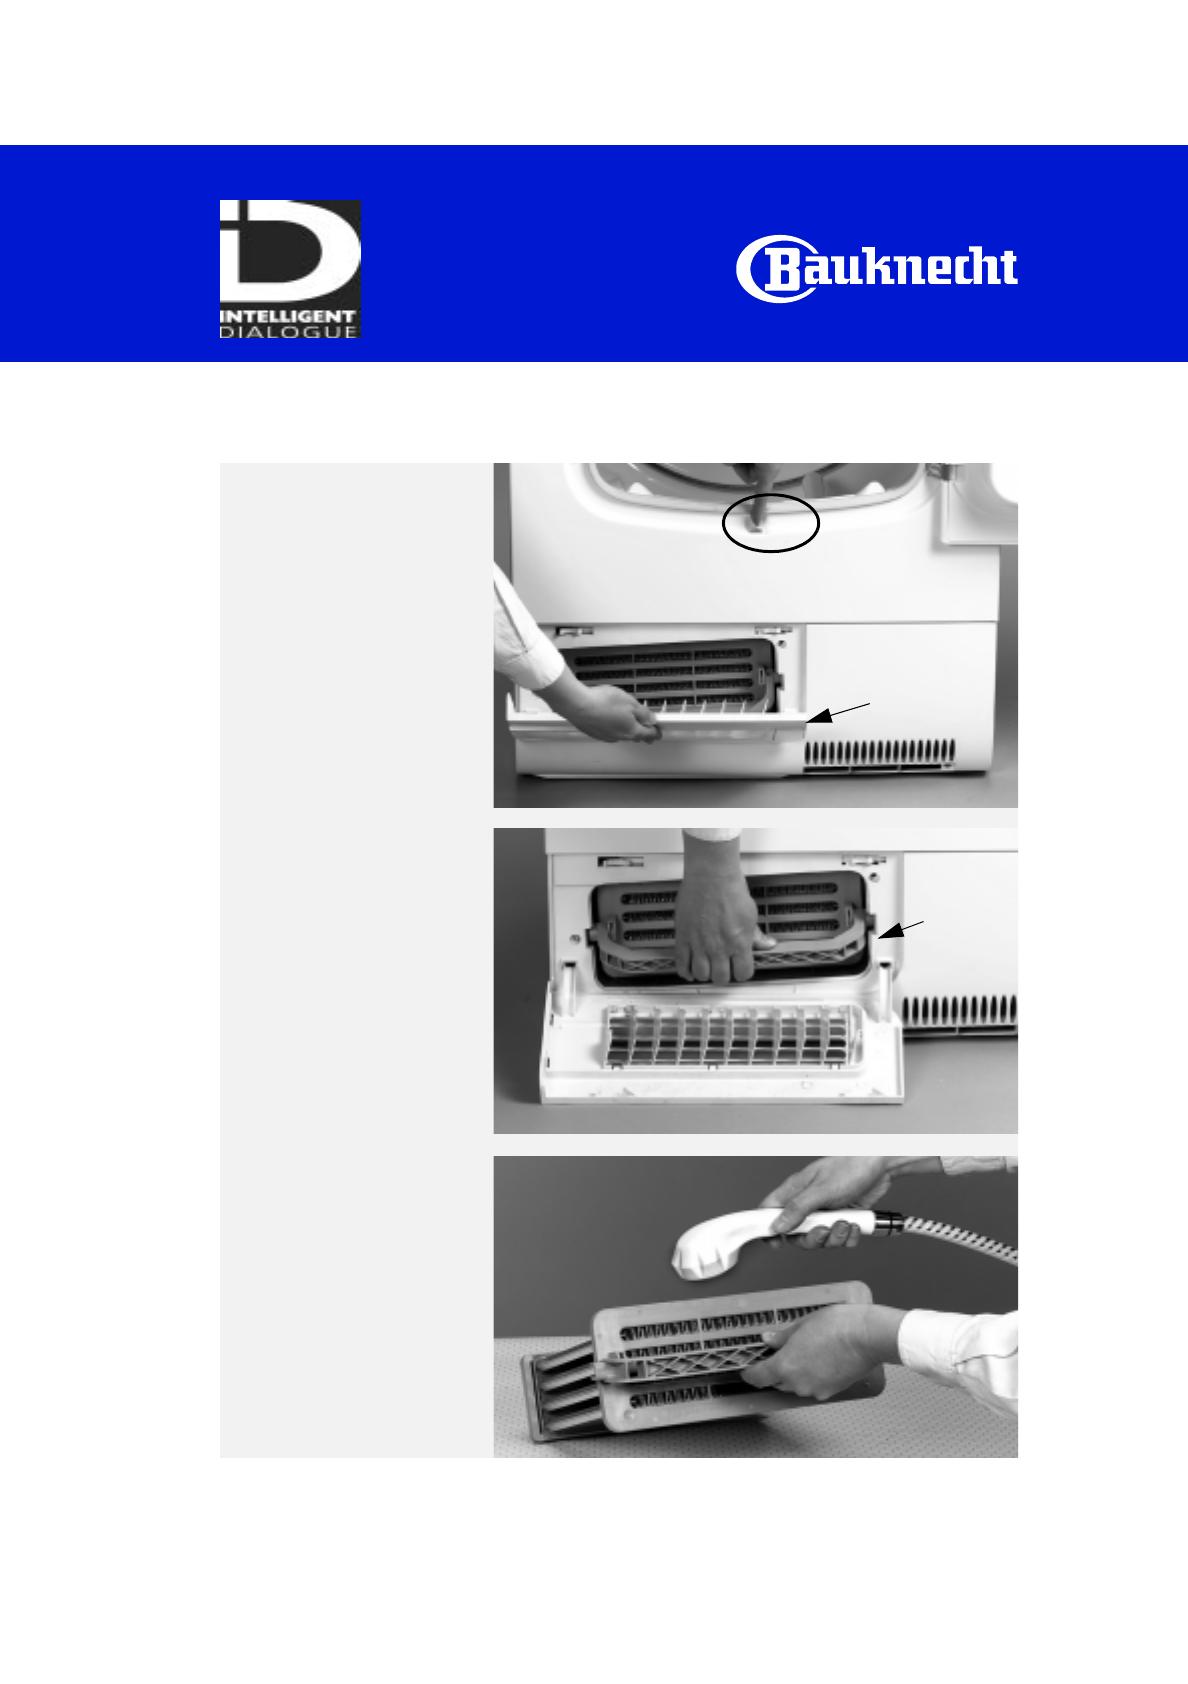 handleiding bauknecht trkp 6960 pagina 7 van 8 deutsch. Black Bedroom Furniture Sets. Home Design Ideas